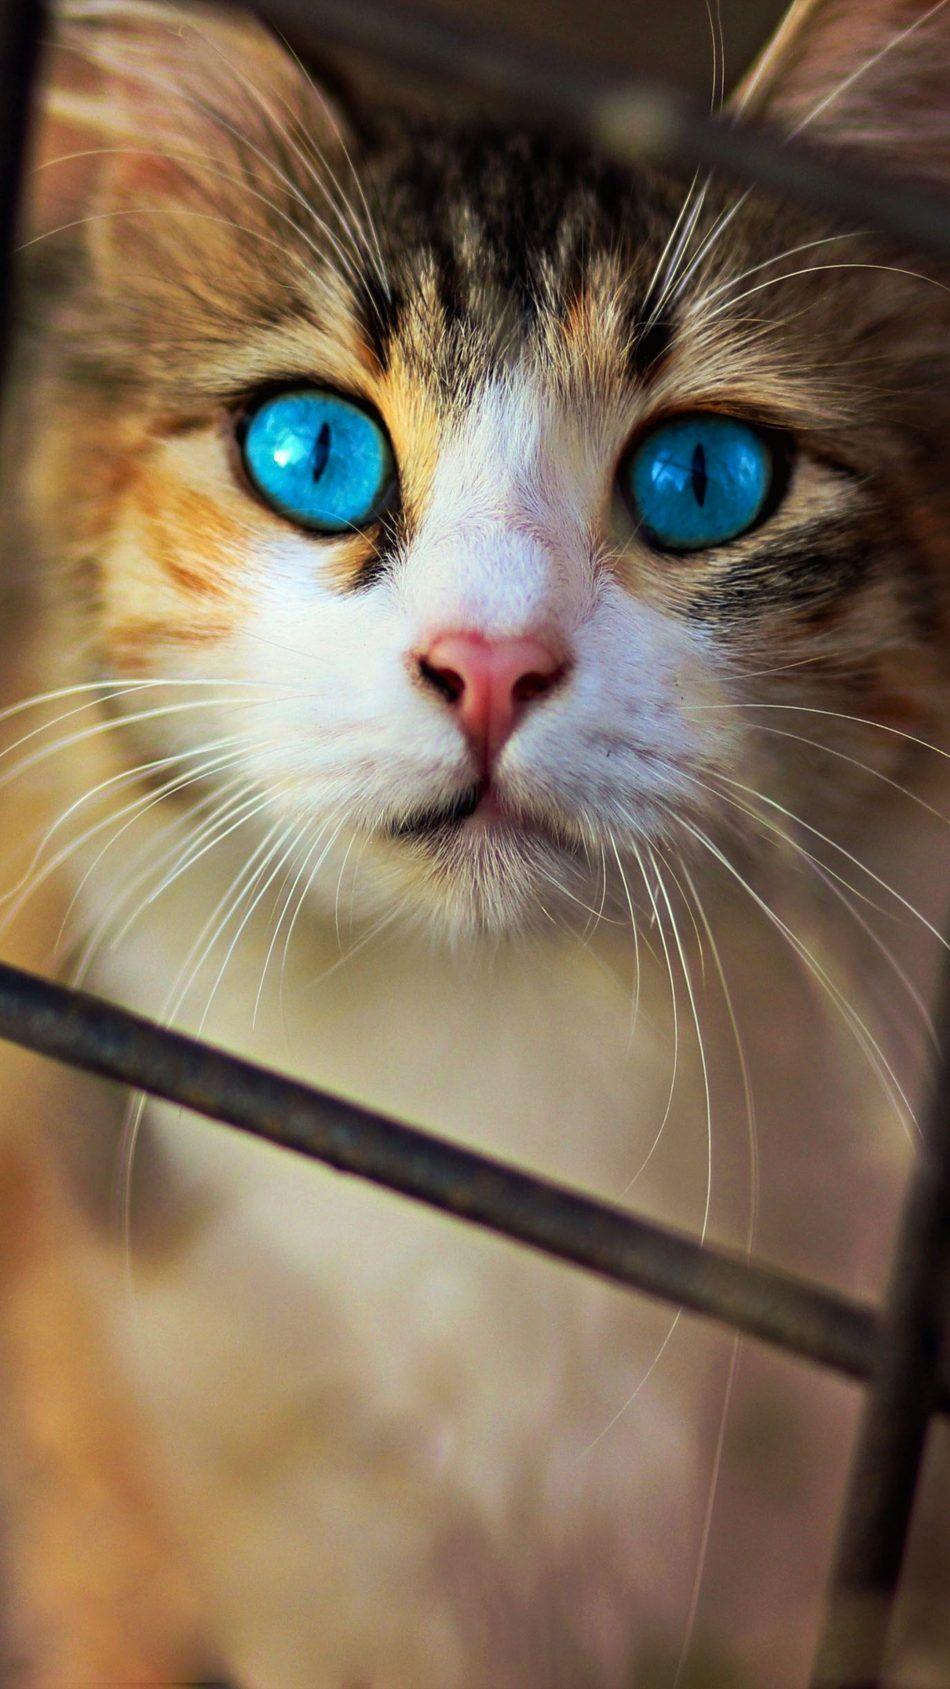 Cute Cat Blue Eyes 4k Ultra Hd Mobile Wallpaper Cute Cats Cat With Blue Eyes Beautiful Cats